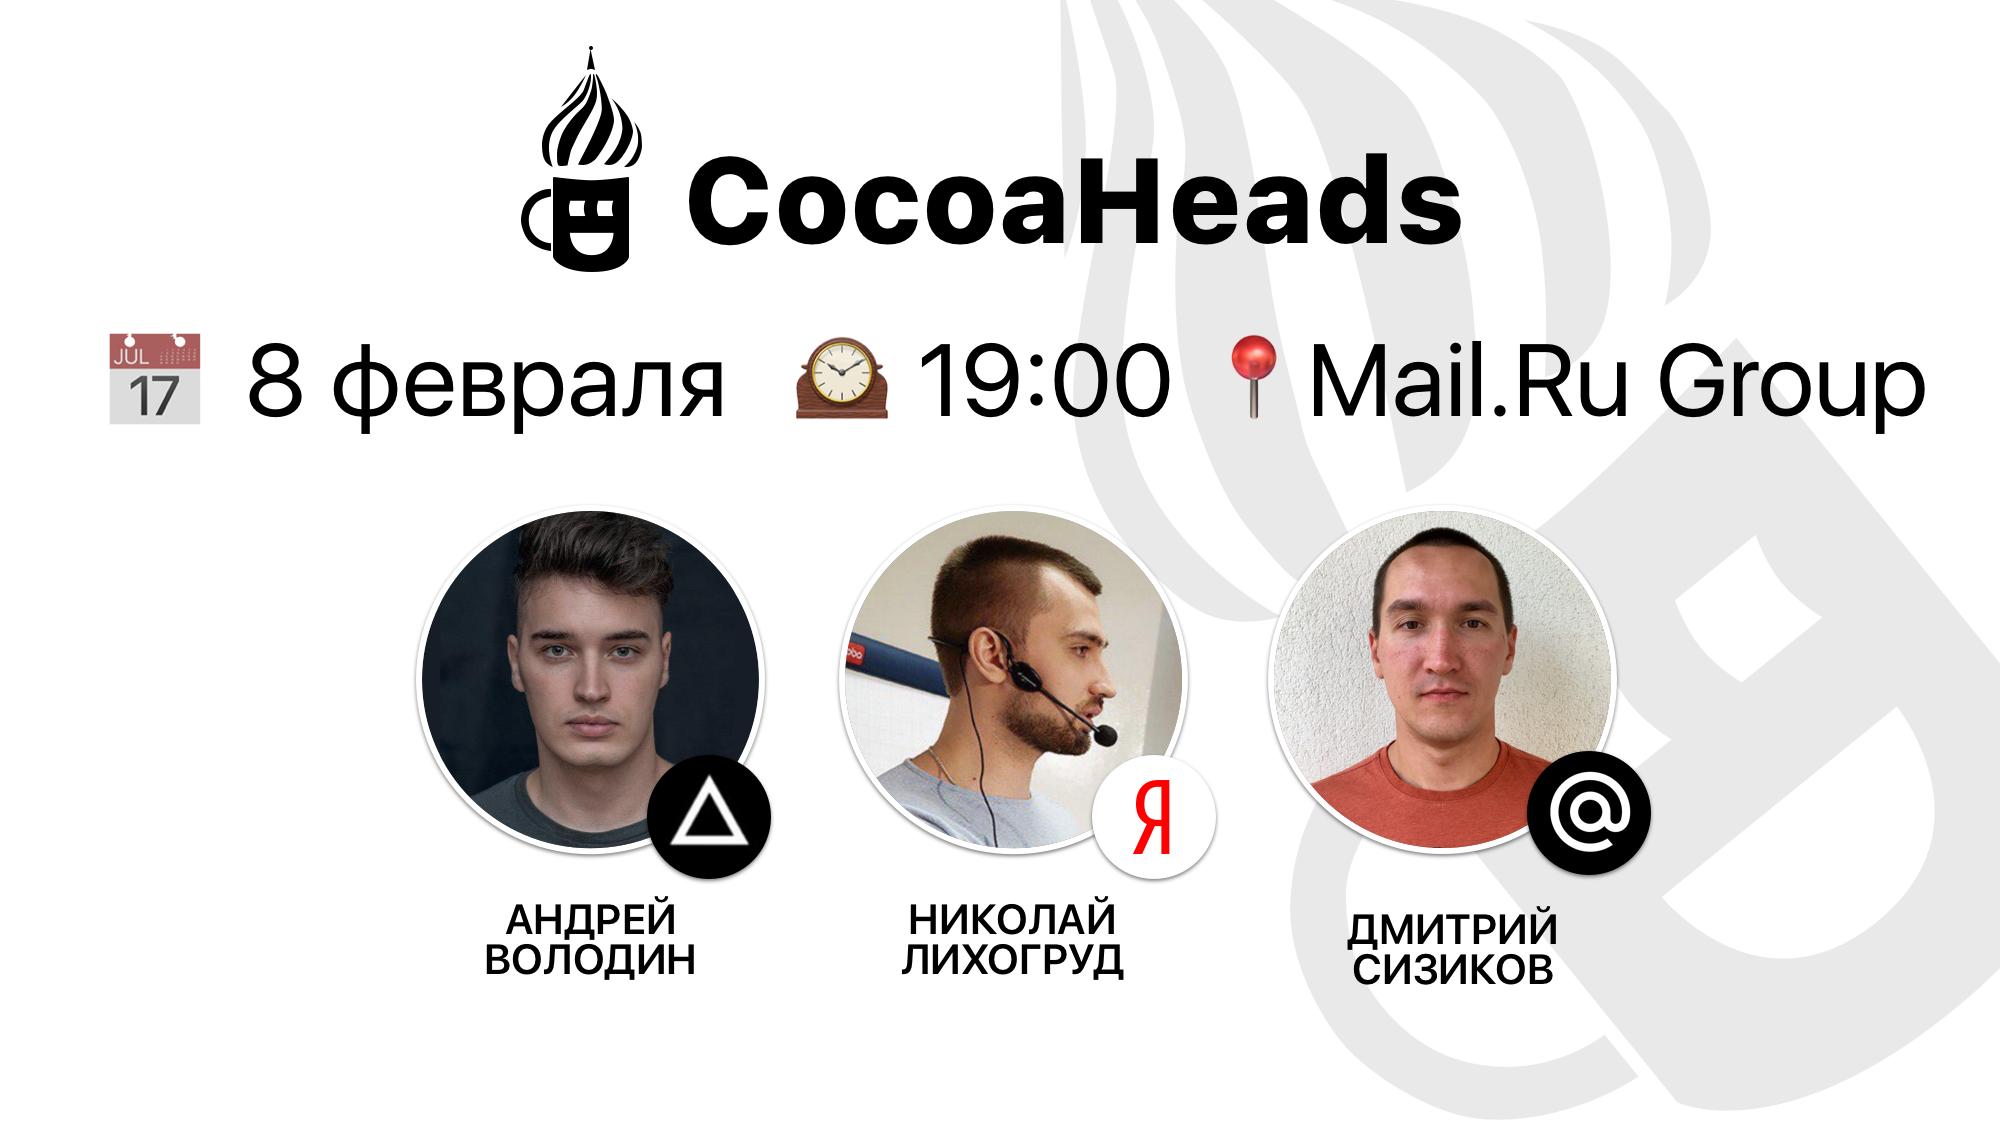 Ждём всех на очередном CocoaHeads Meetup